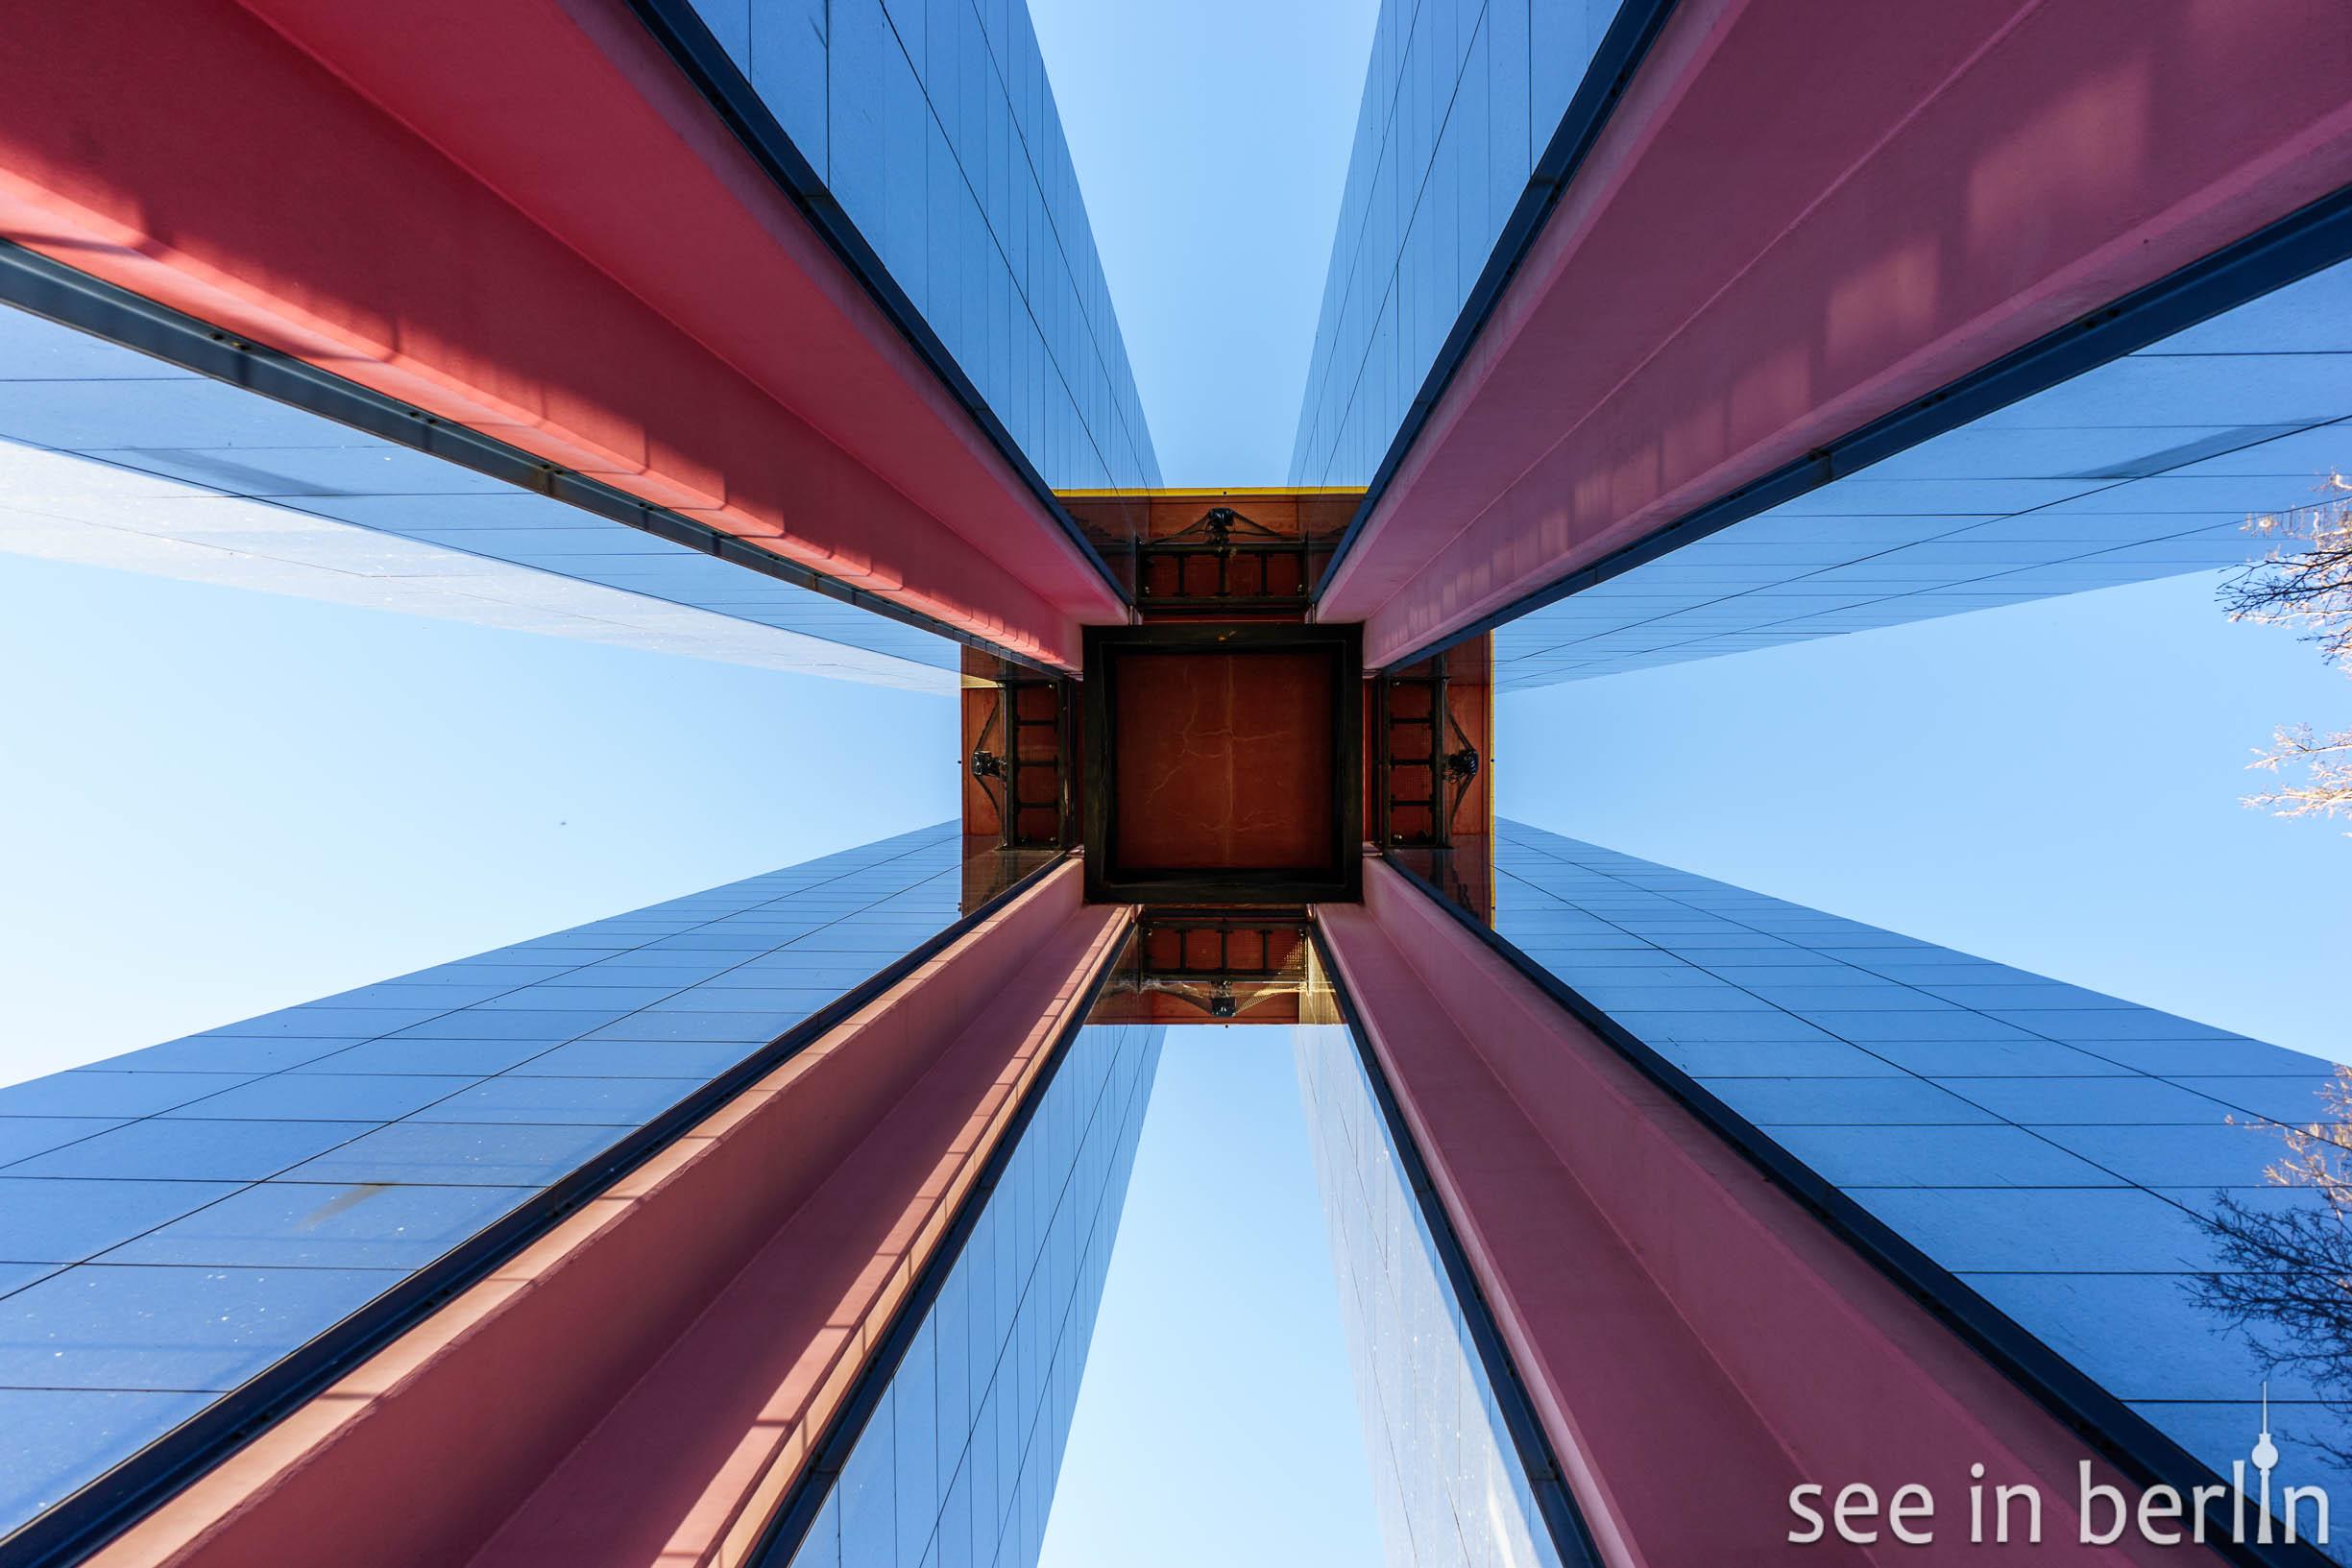 Carillon Glockspiel in Berlin-Tiergarten